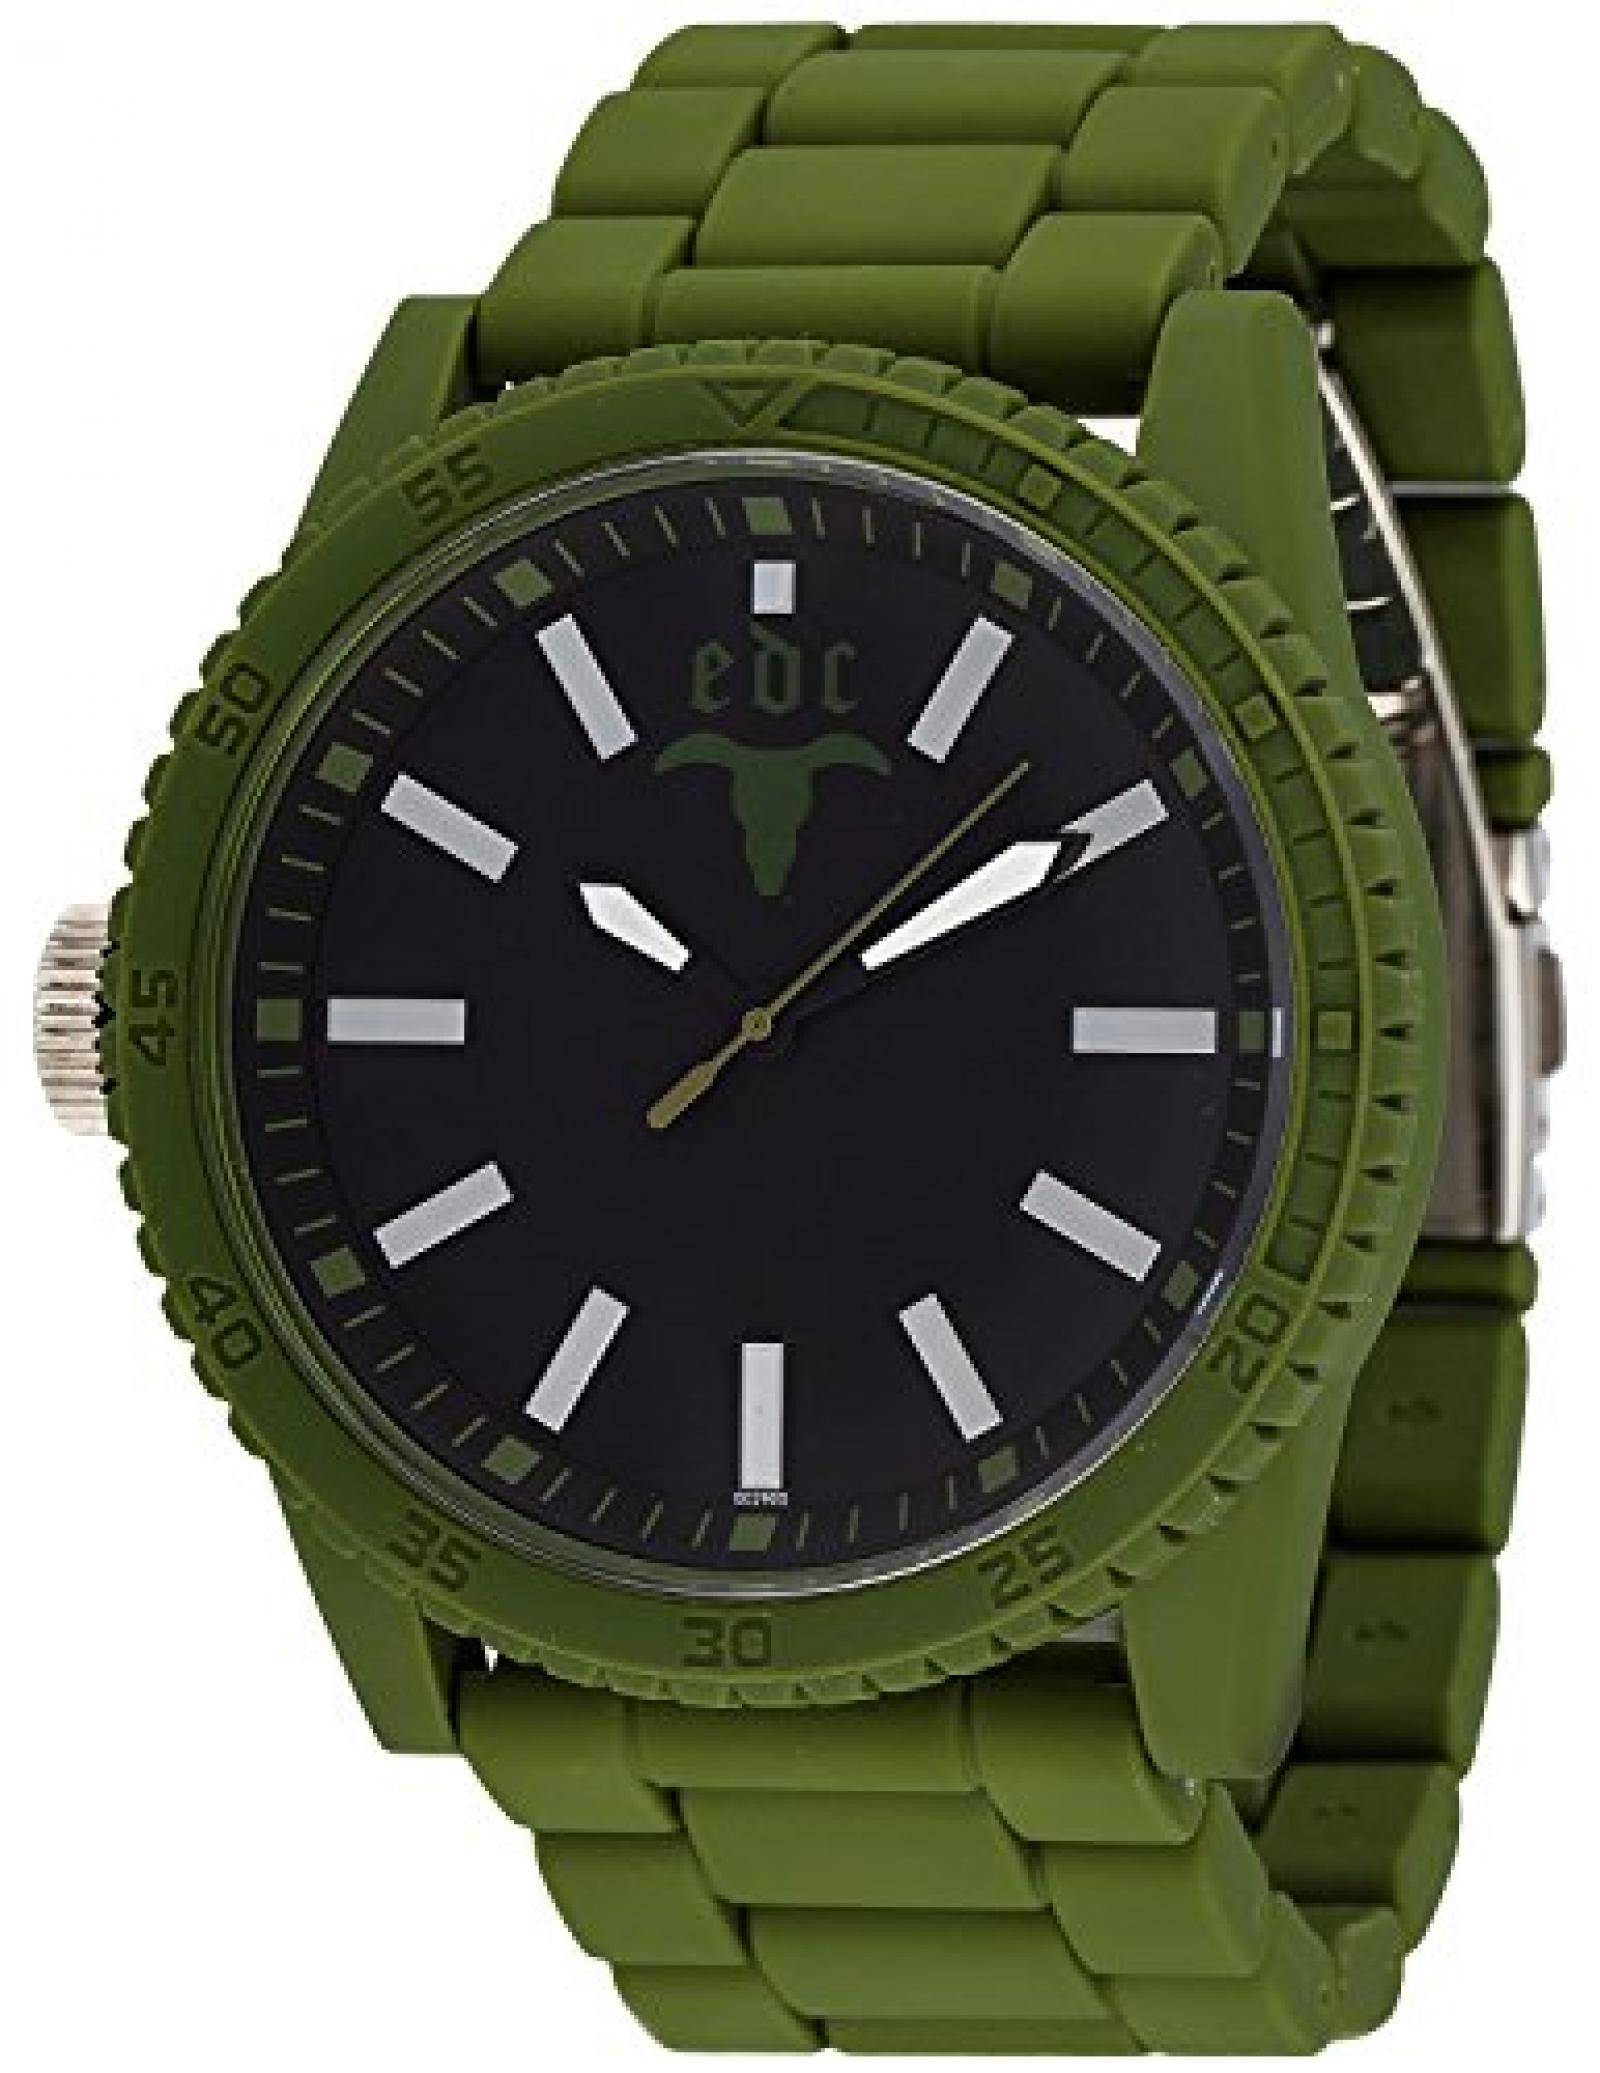 Edc Herren-Armbanduhr XL Military Star Analog Quarz Plastik EE100291006